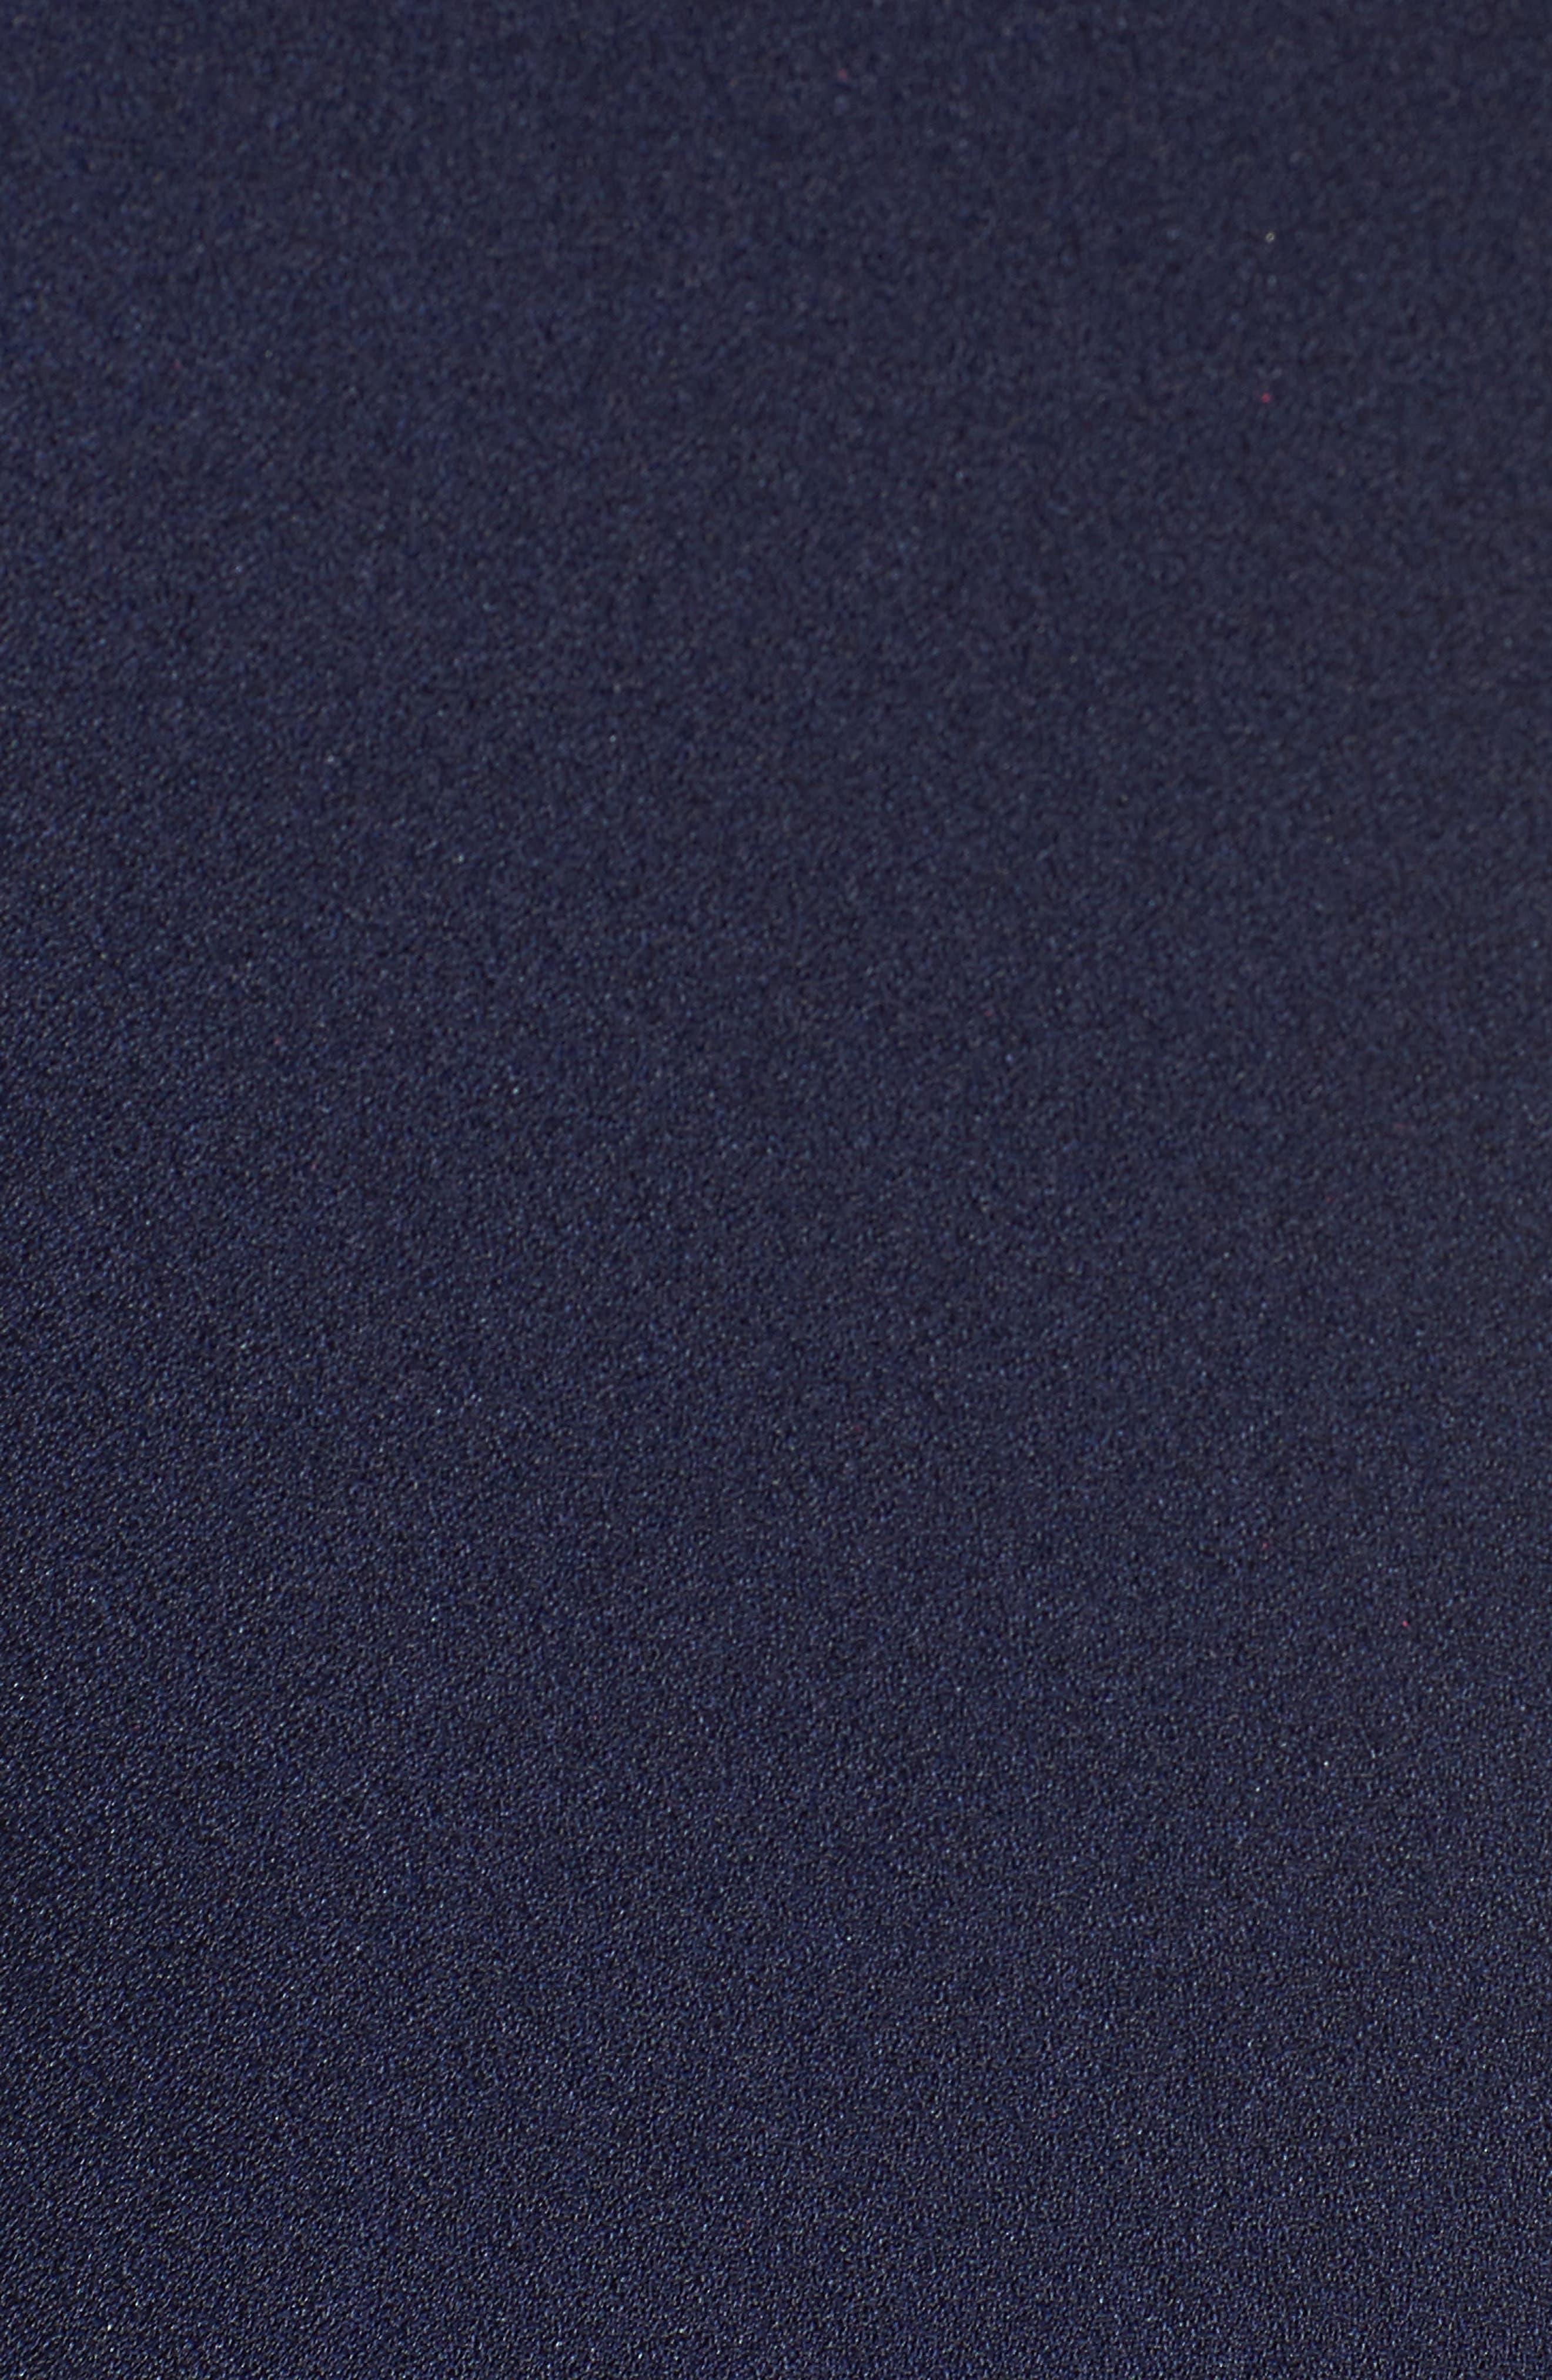 Off the Shoulder Sheath Dress,                             Alternate thumbnail 5, color,                             410